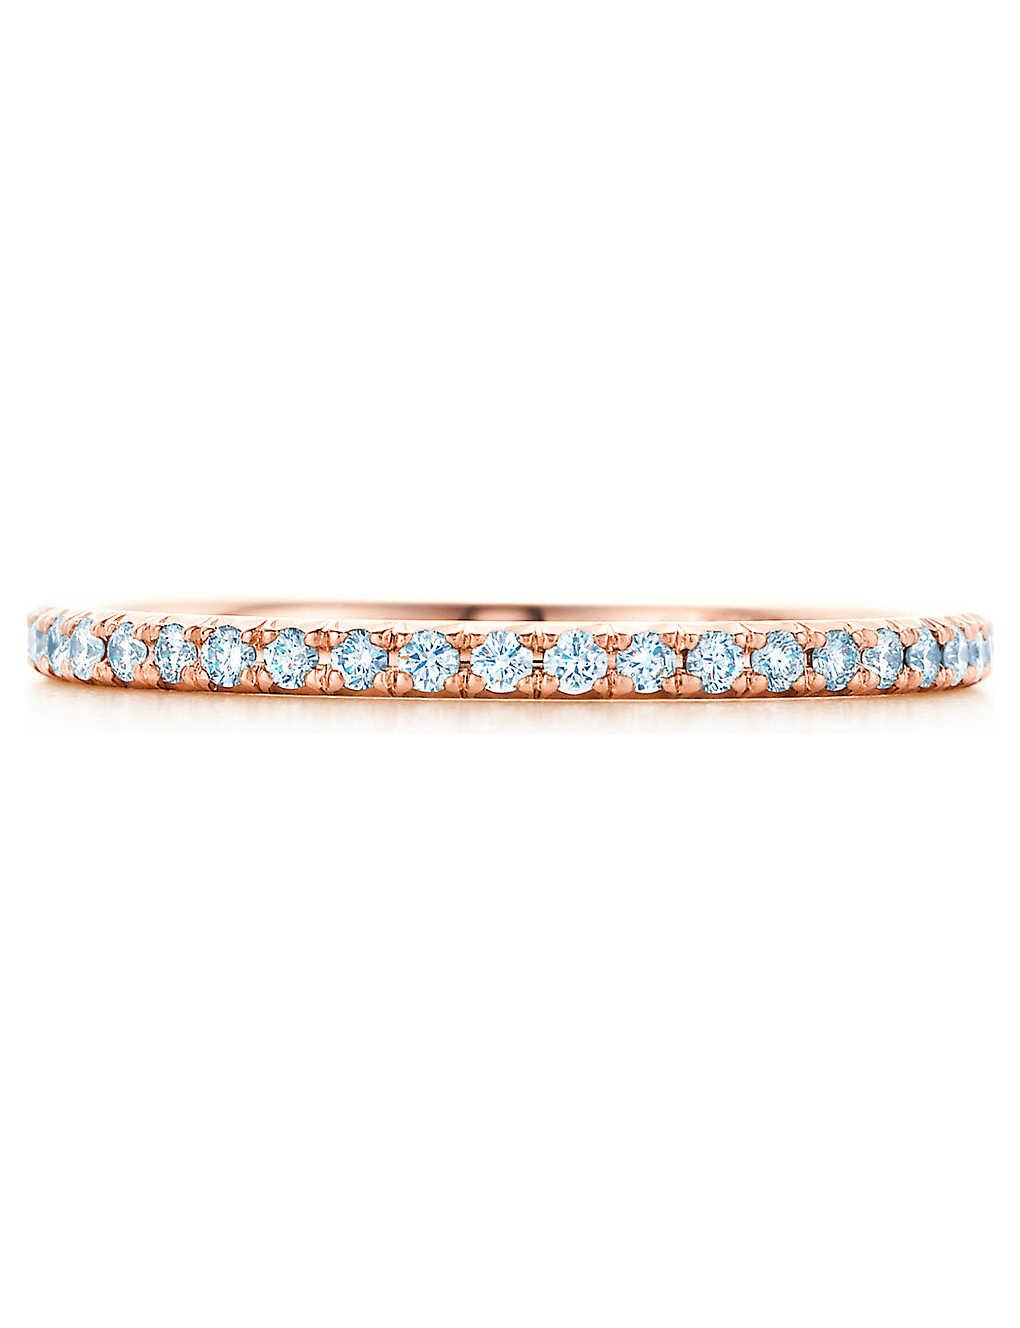 3dda28474 TIFFANY & CO - Tiffany Metro ring in 18k rose gold with diamonds ...